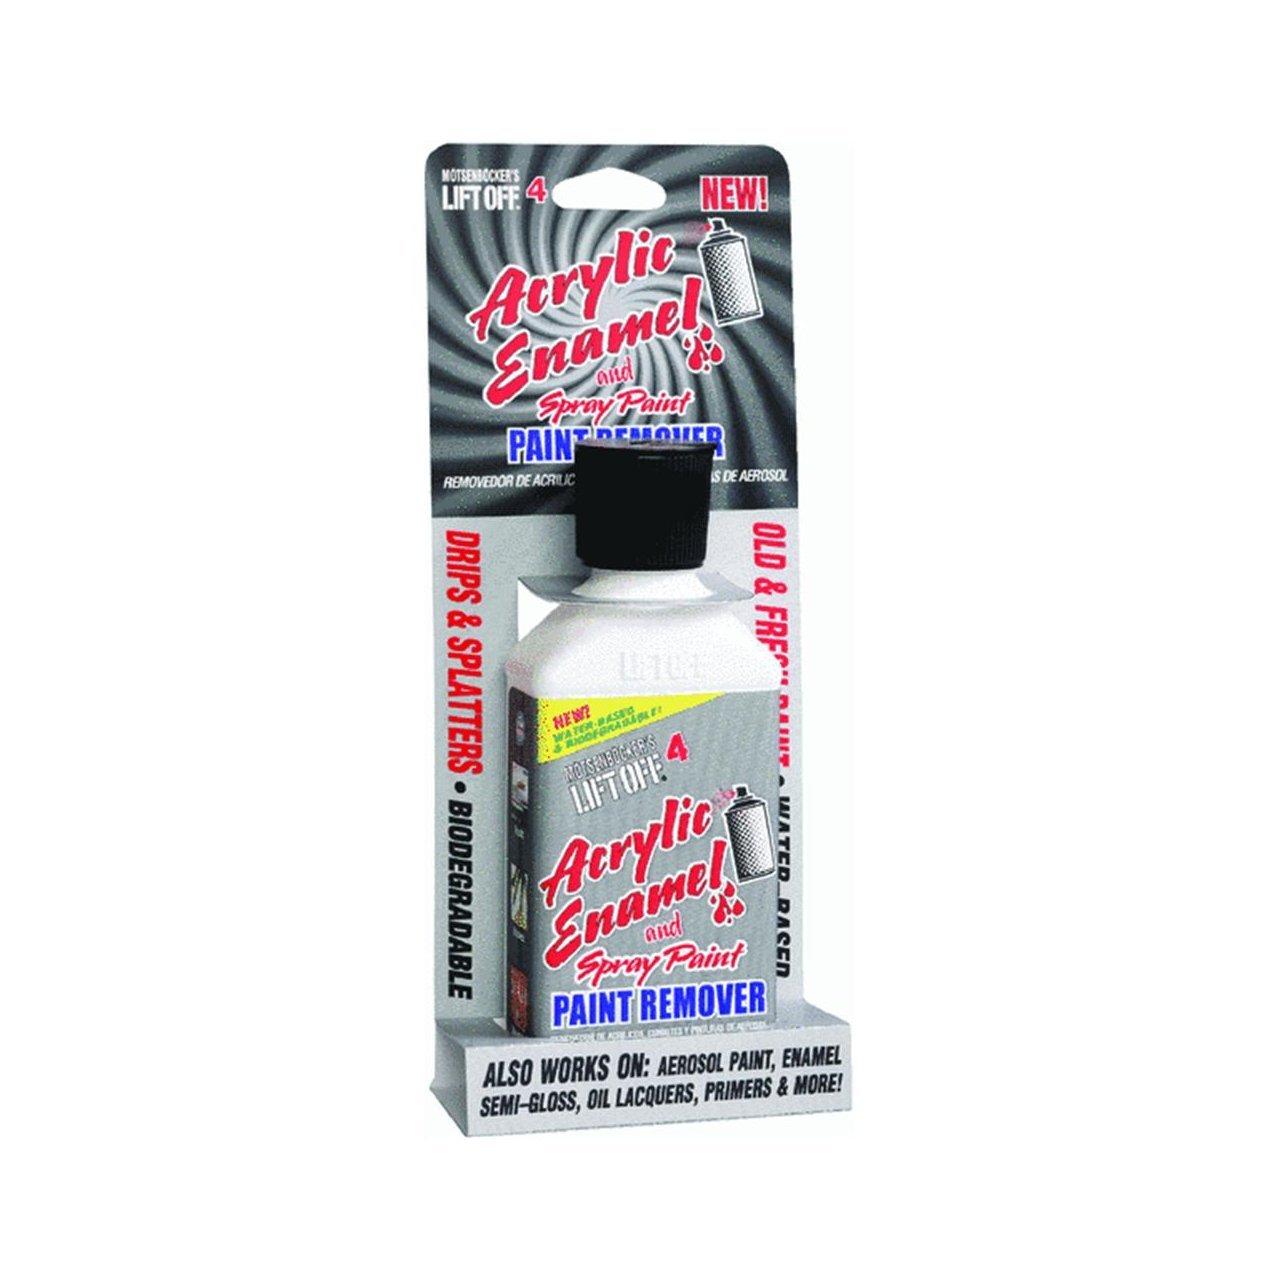 Motsenbocker 41245 Acrylic Enamel And Spray Paint Remover MLO41245XXX0